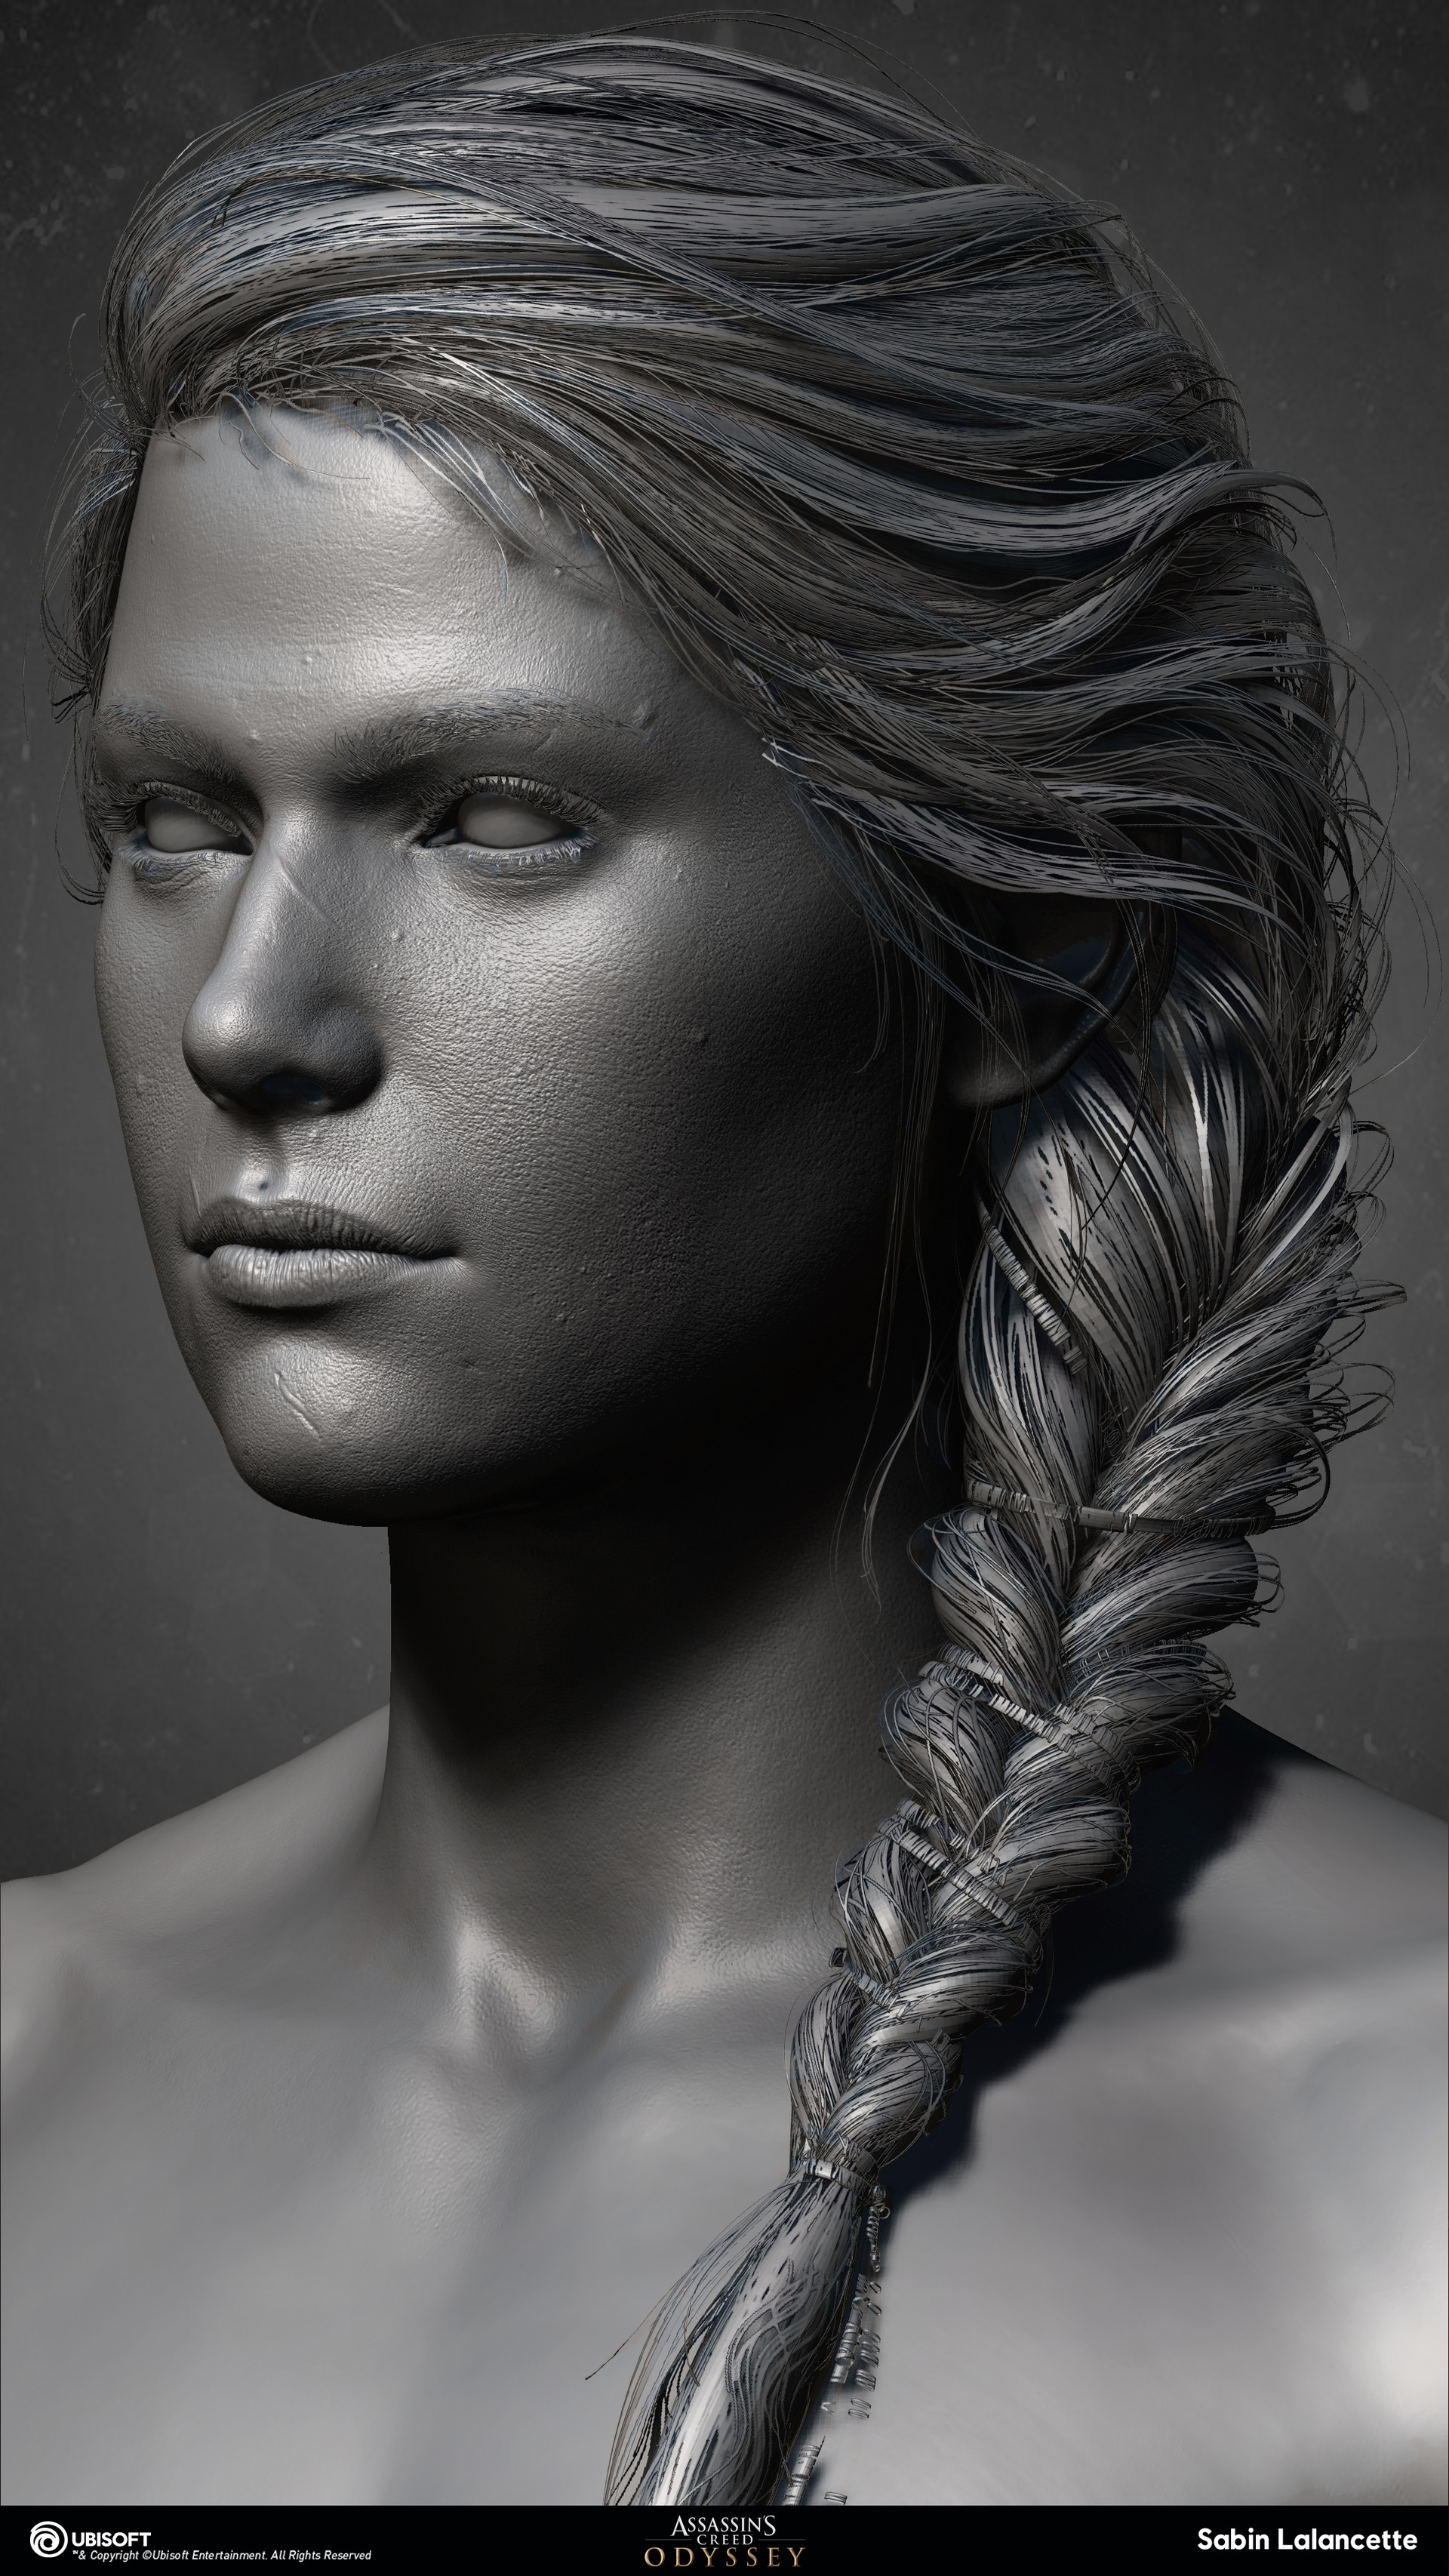 sabin-lalancette-artblast-fullsizezb-hex-portrait-neutral-3quarterleft-kassandra-slalancette